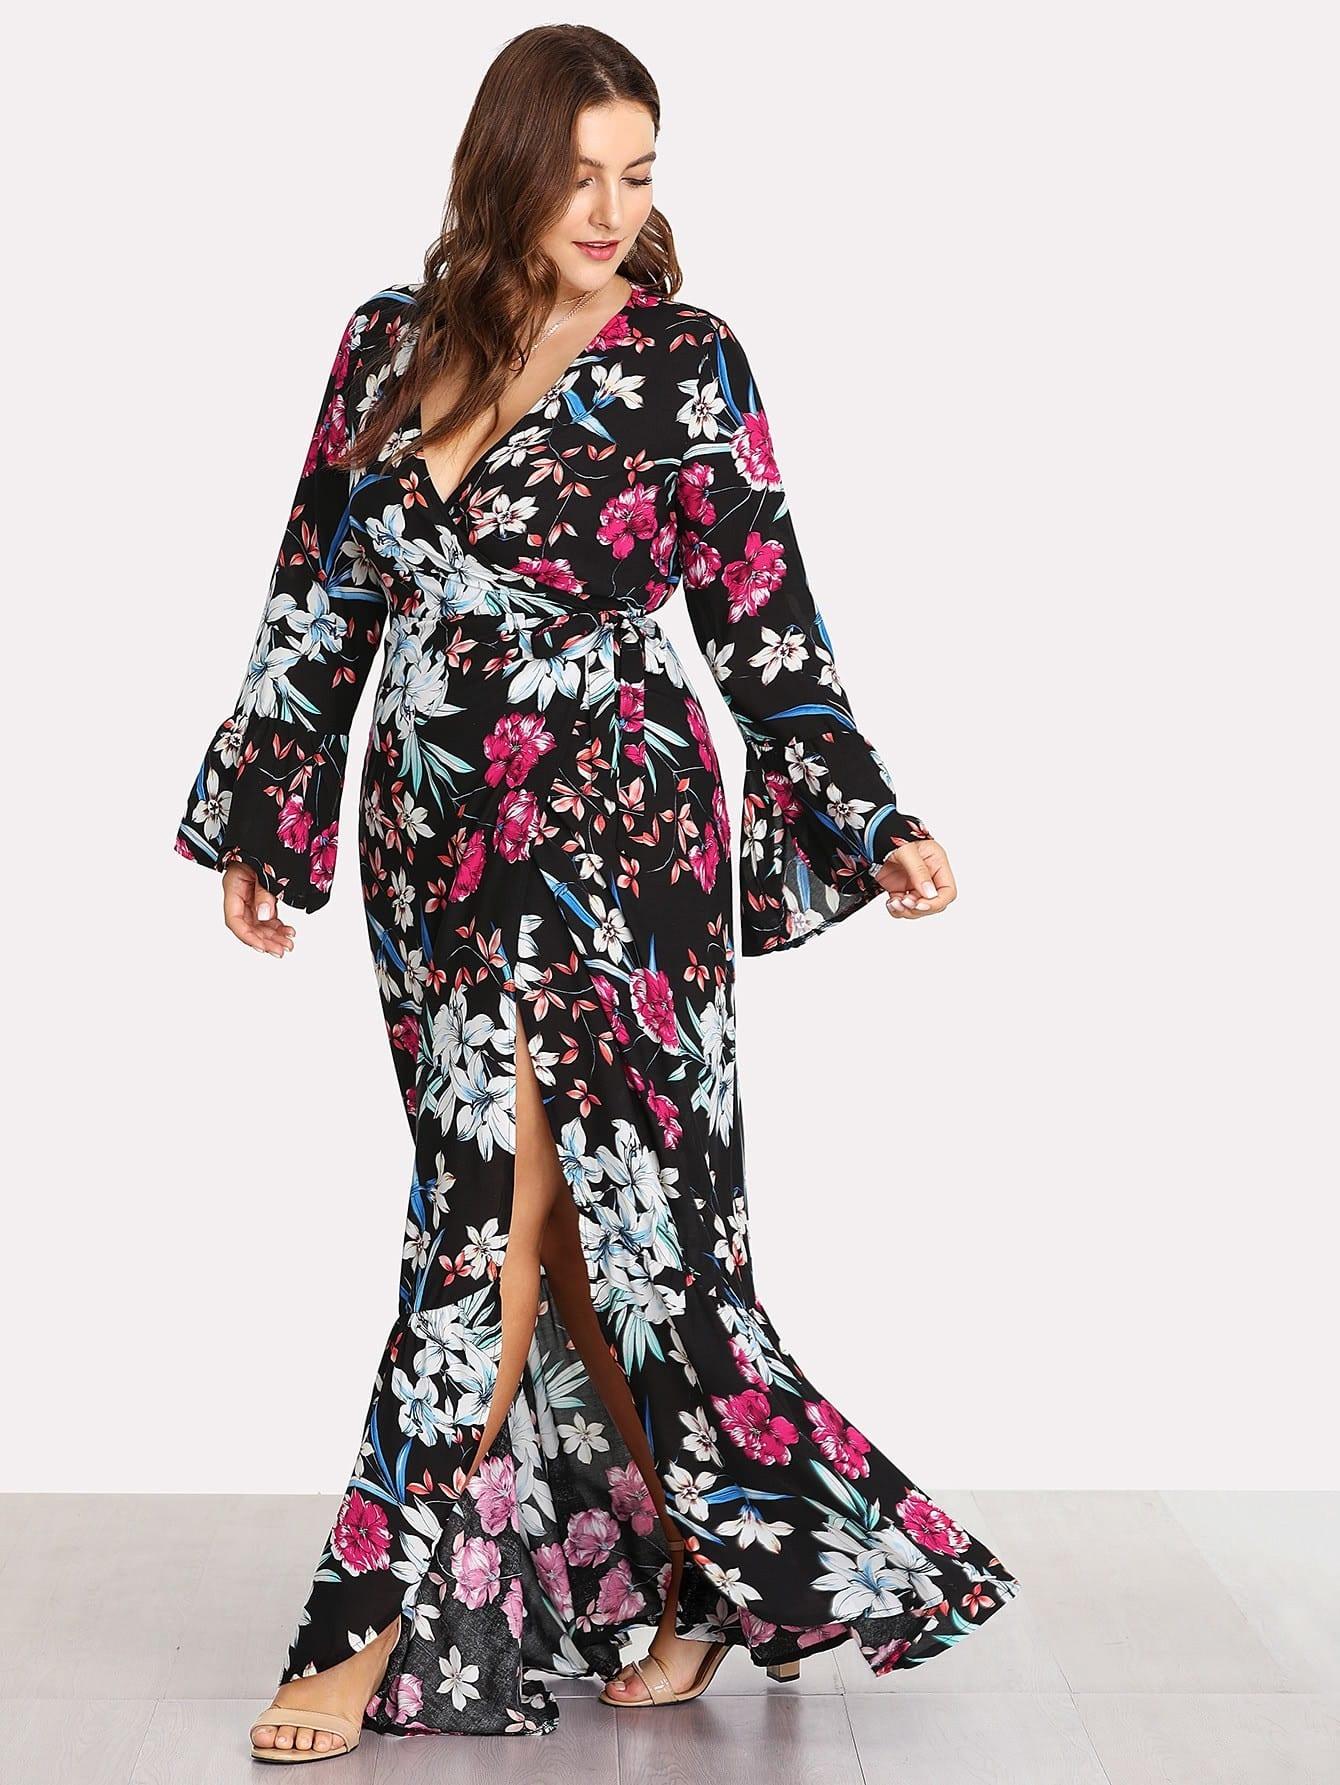 Fluted Sleeve Tie Side Floral Print Dress